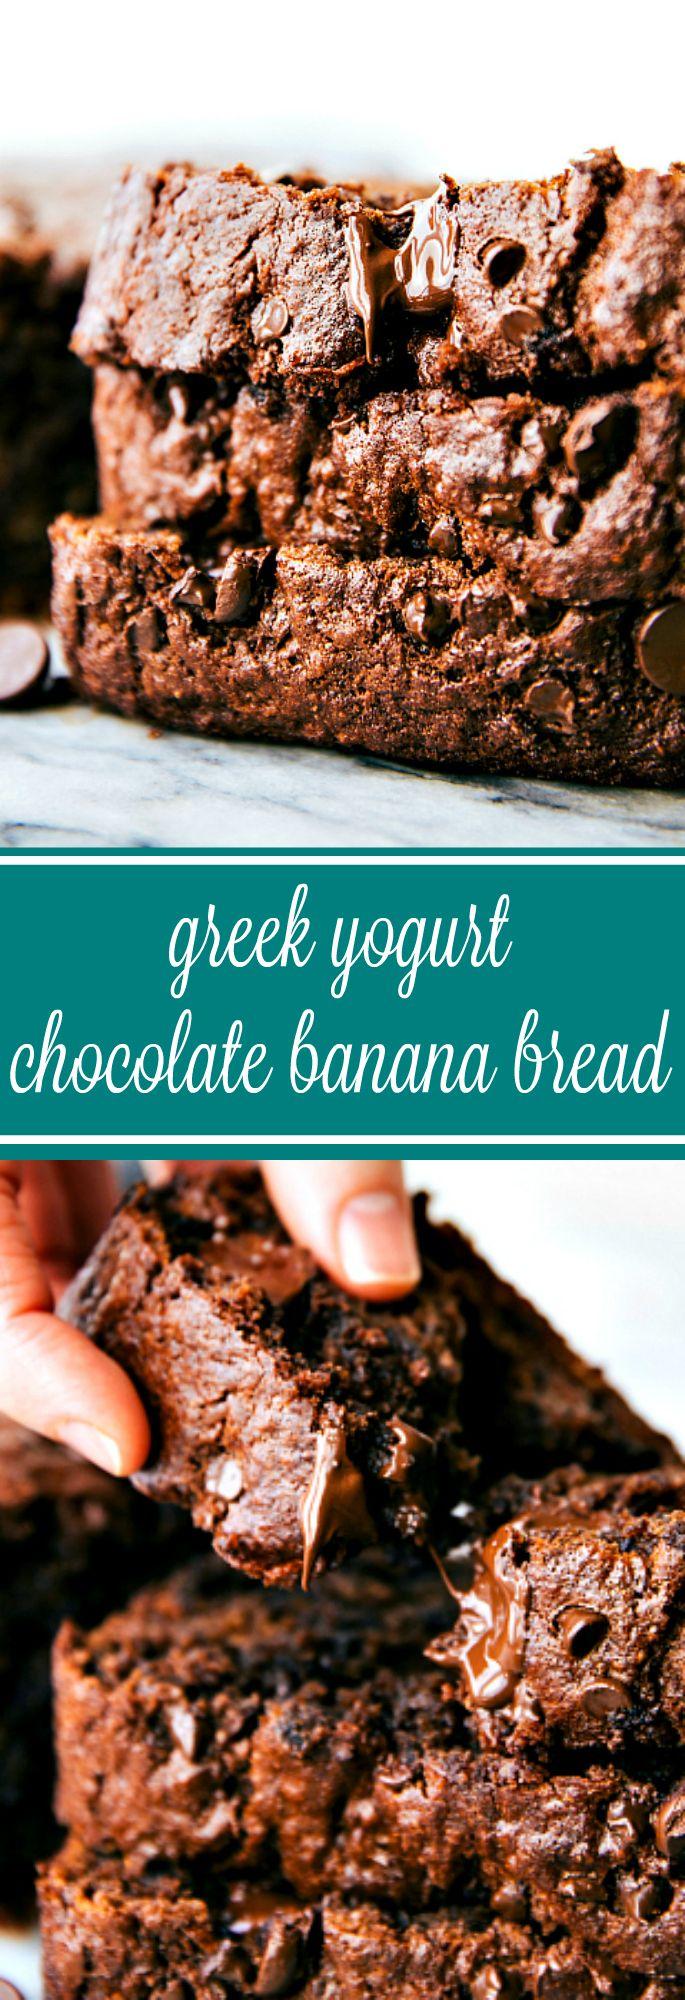 HEALTHY GREEK YOGURT CHOCOLATE BANANA BREAD! A delicious and moist chocolate banana bread made with healthier ingredients! One bowl, no mixers required!